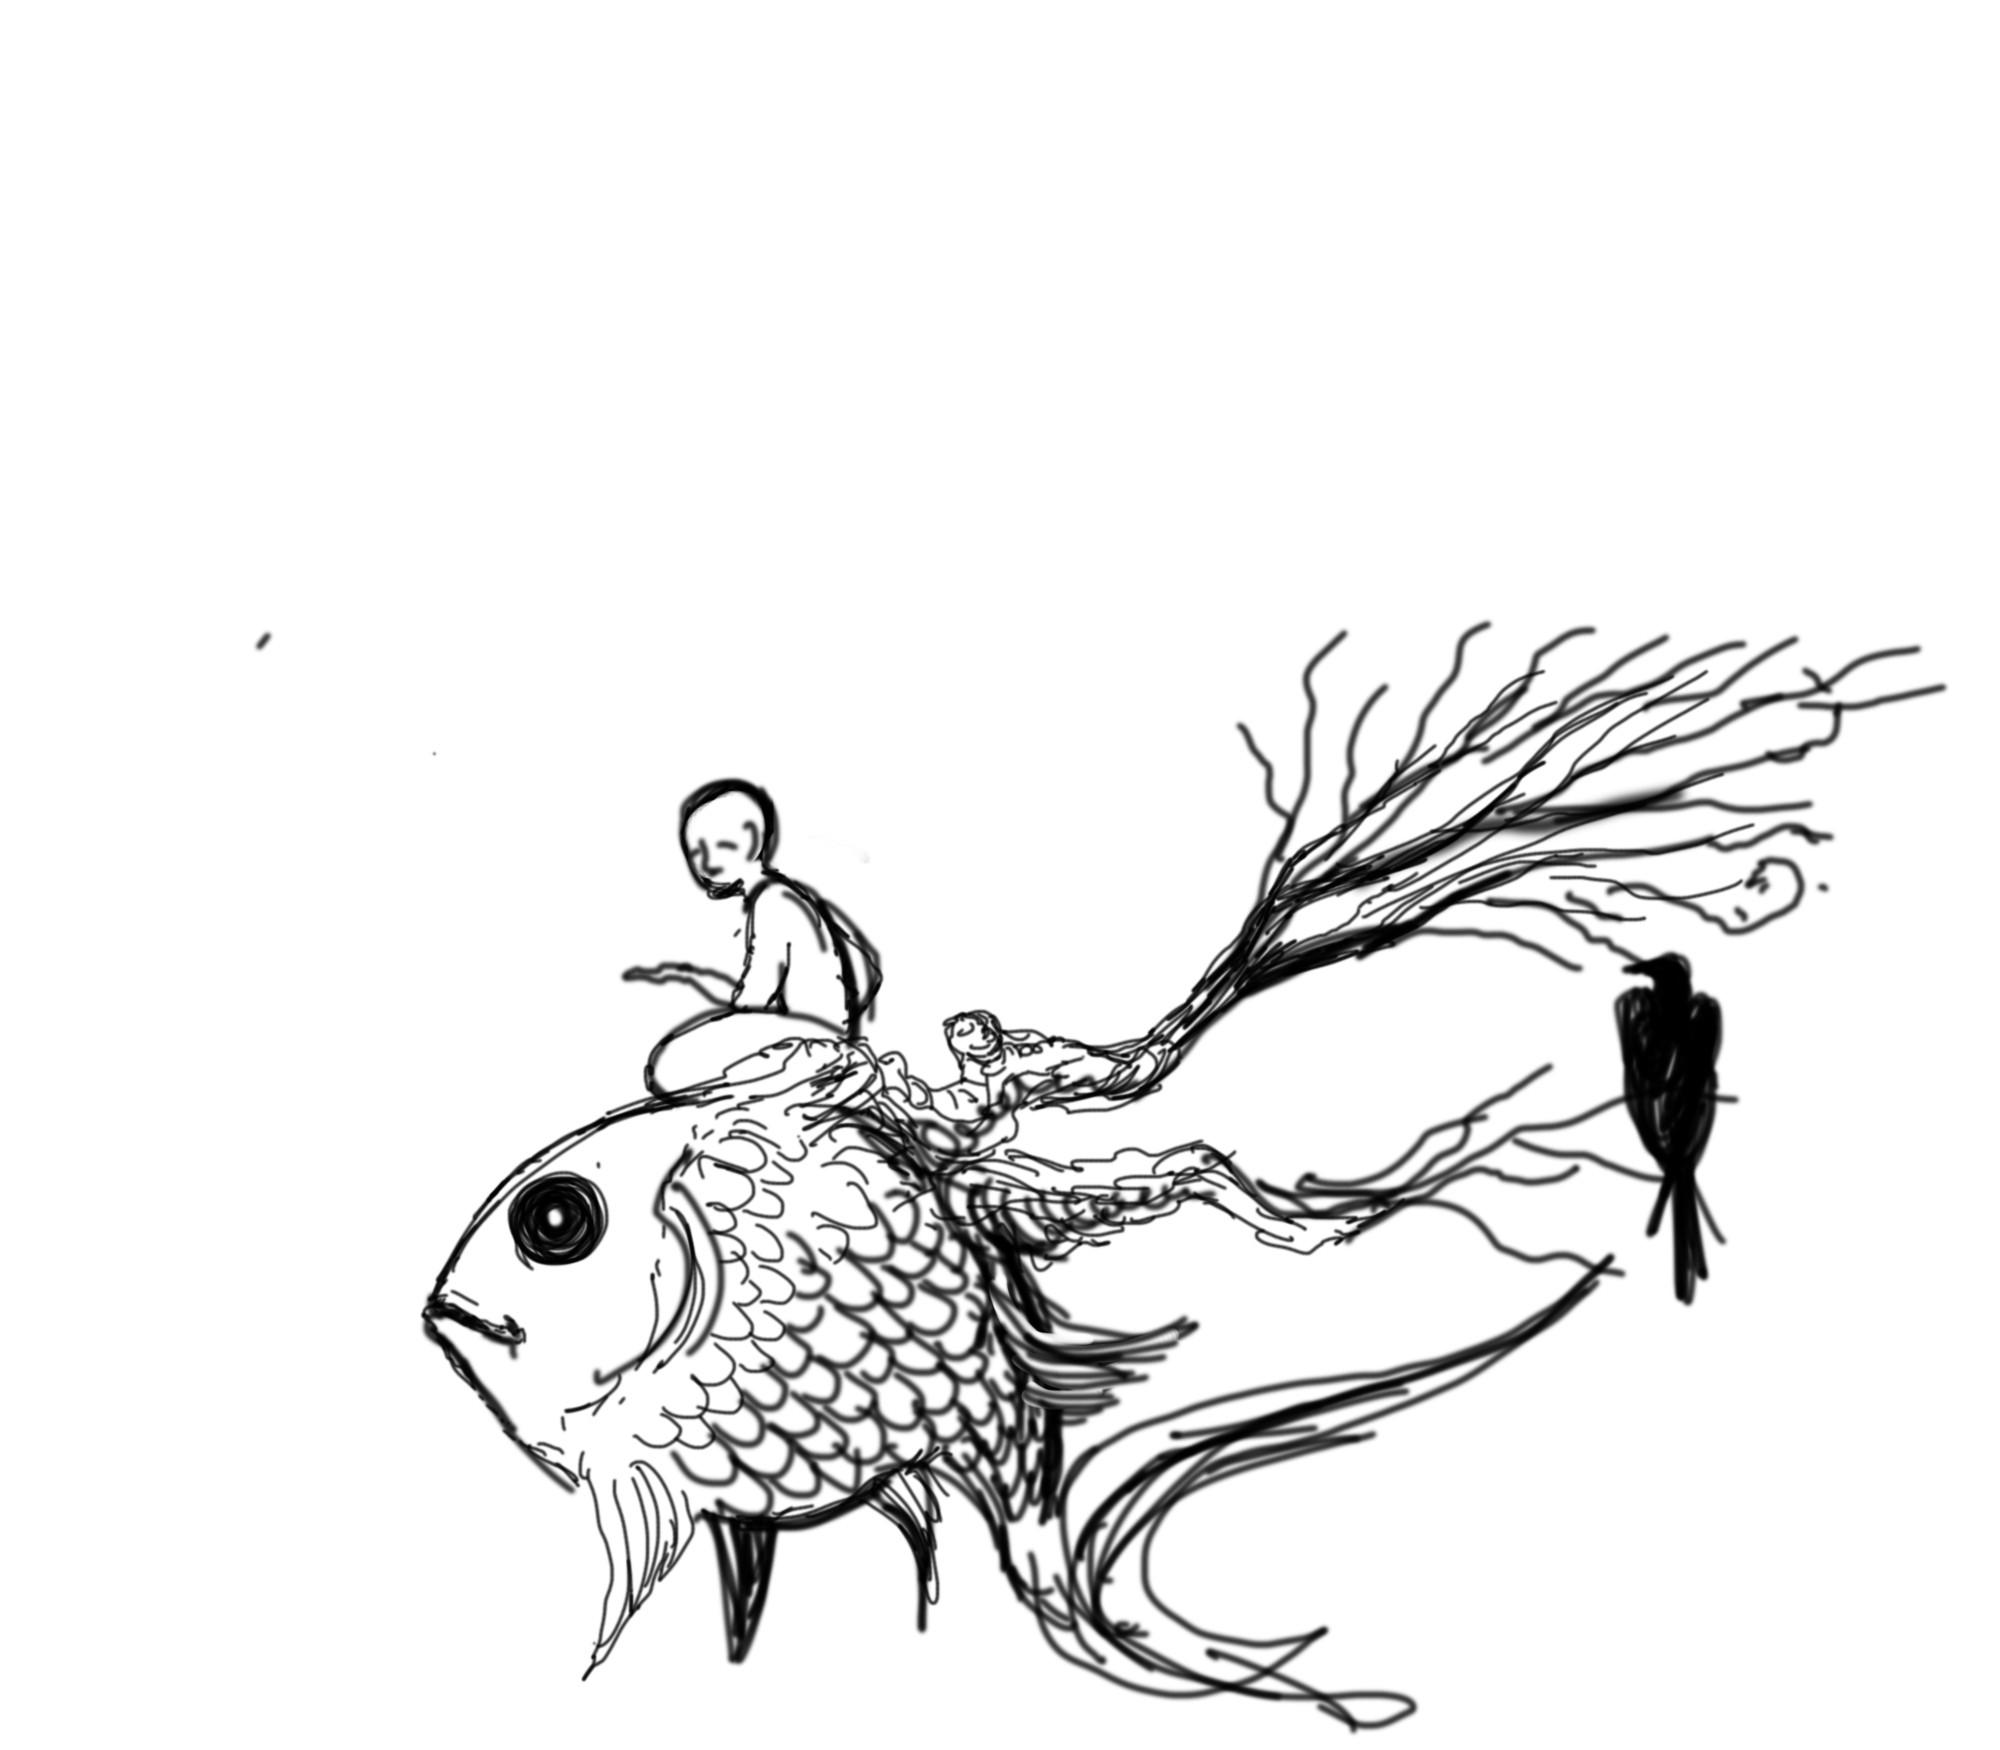 2000x1750 I Am A Surrealist And Fantastic Realist Artist, Ama And I'Ll Draw